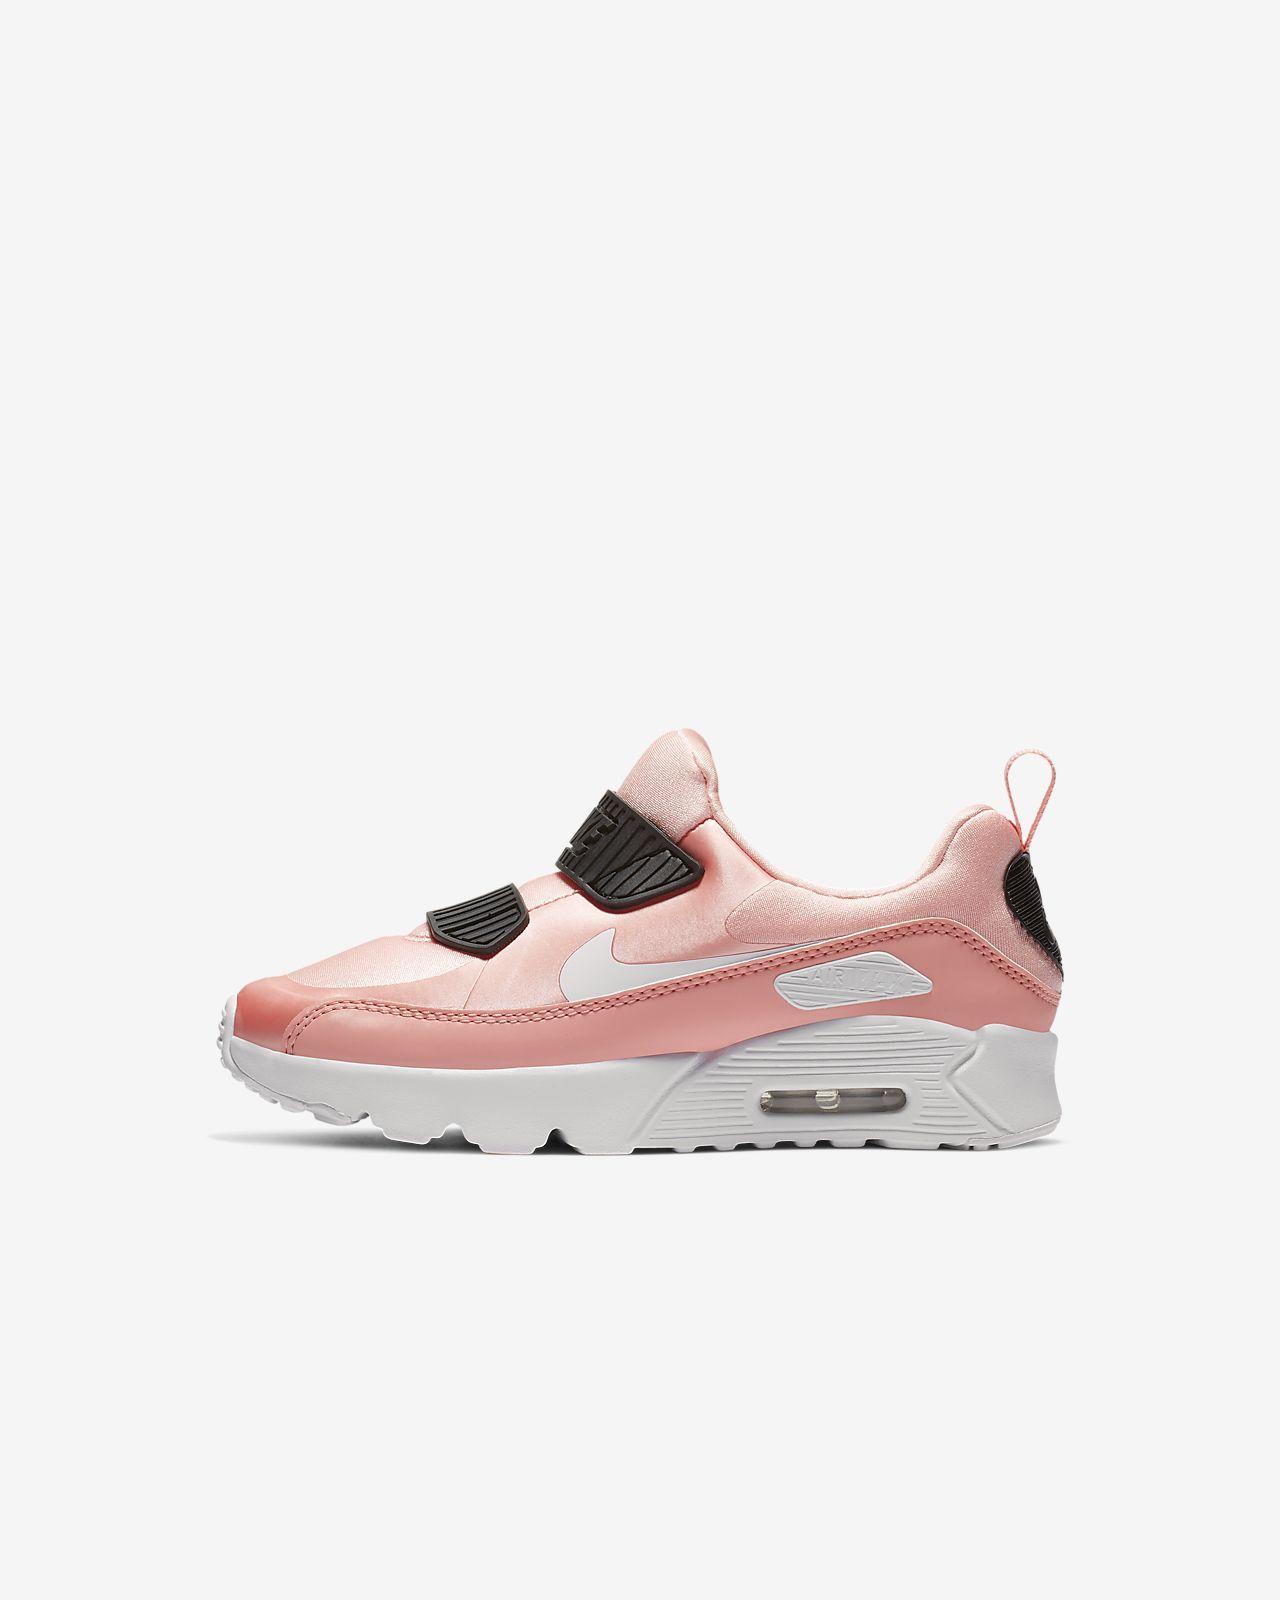 Nike Air Max Tiny 90 VDAY Little Kids' Shoe